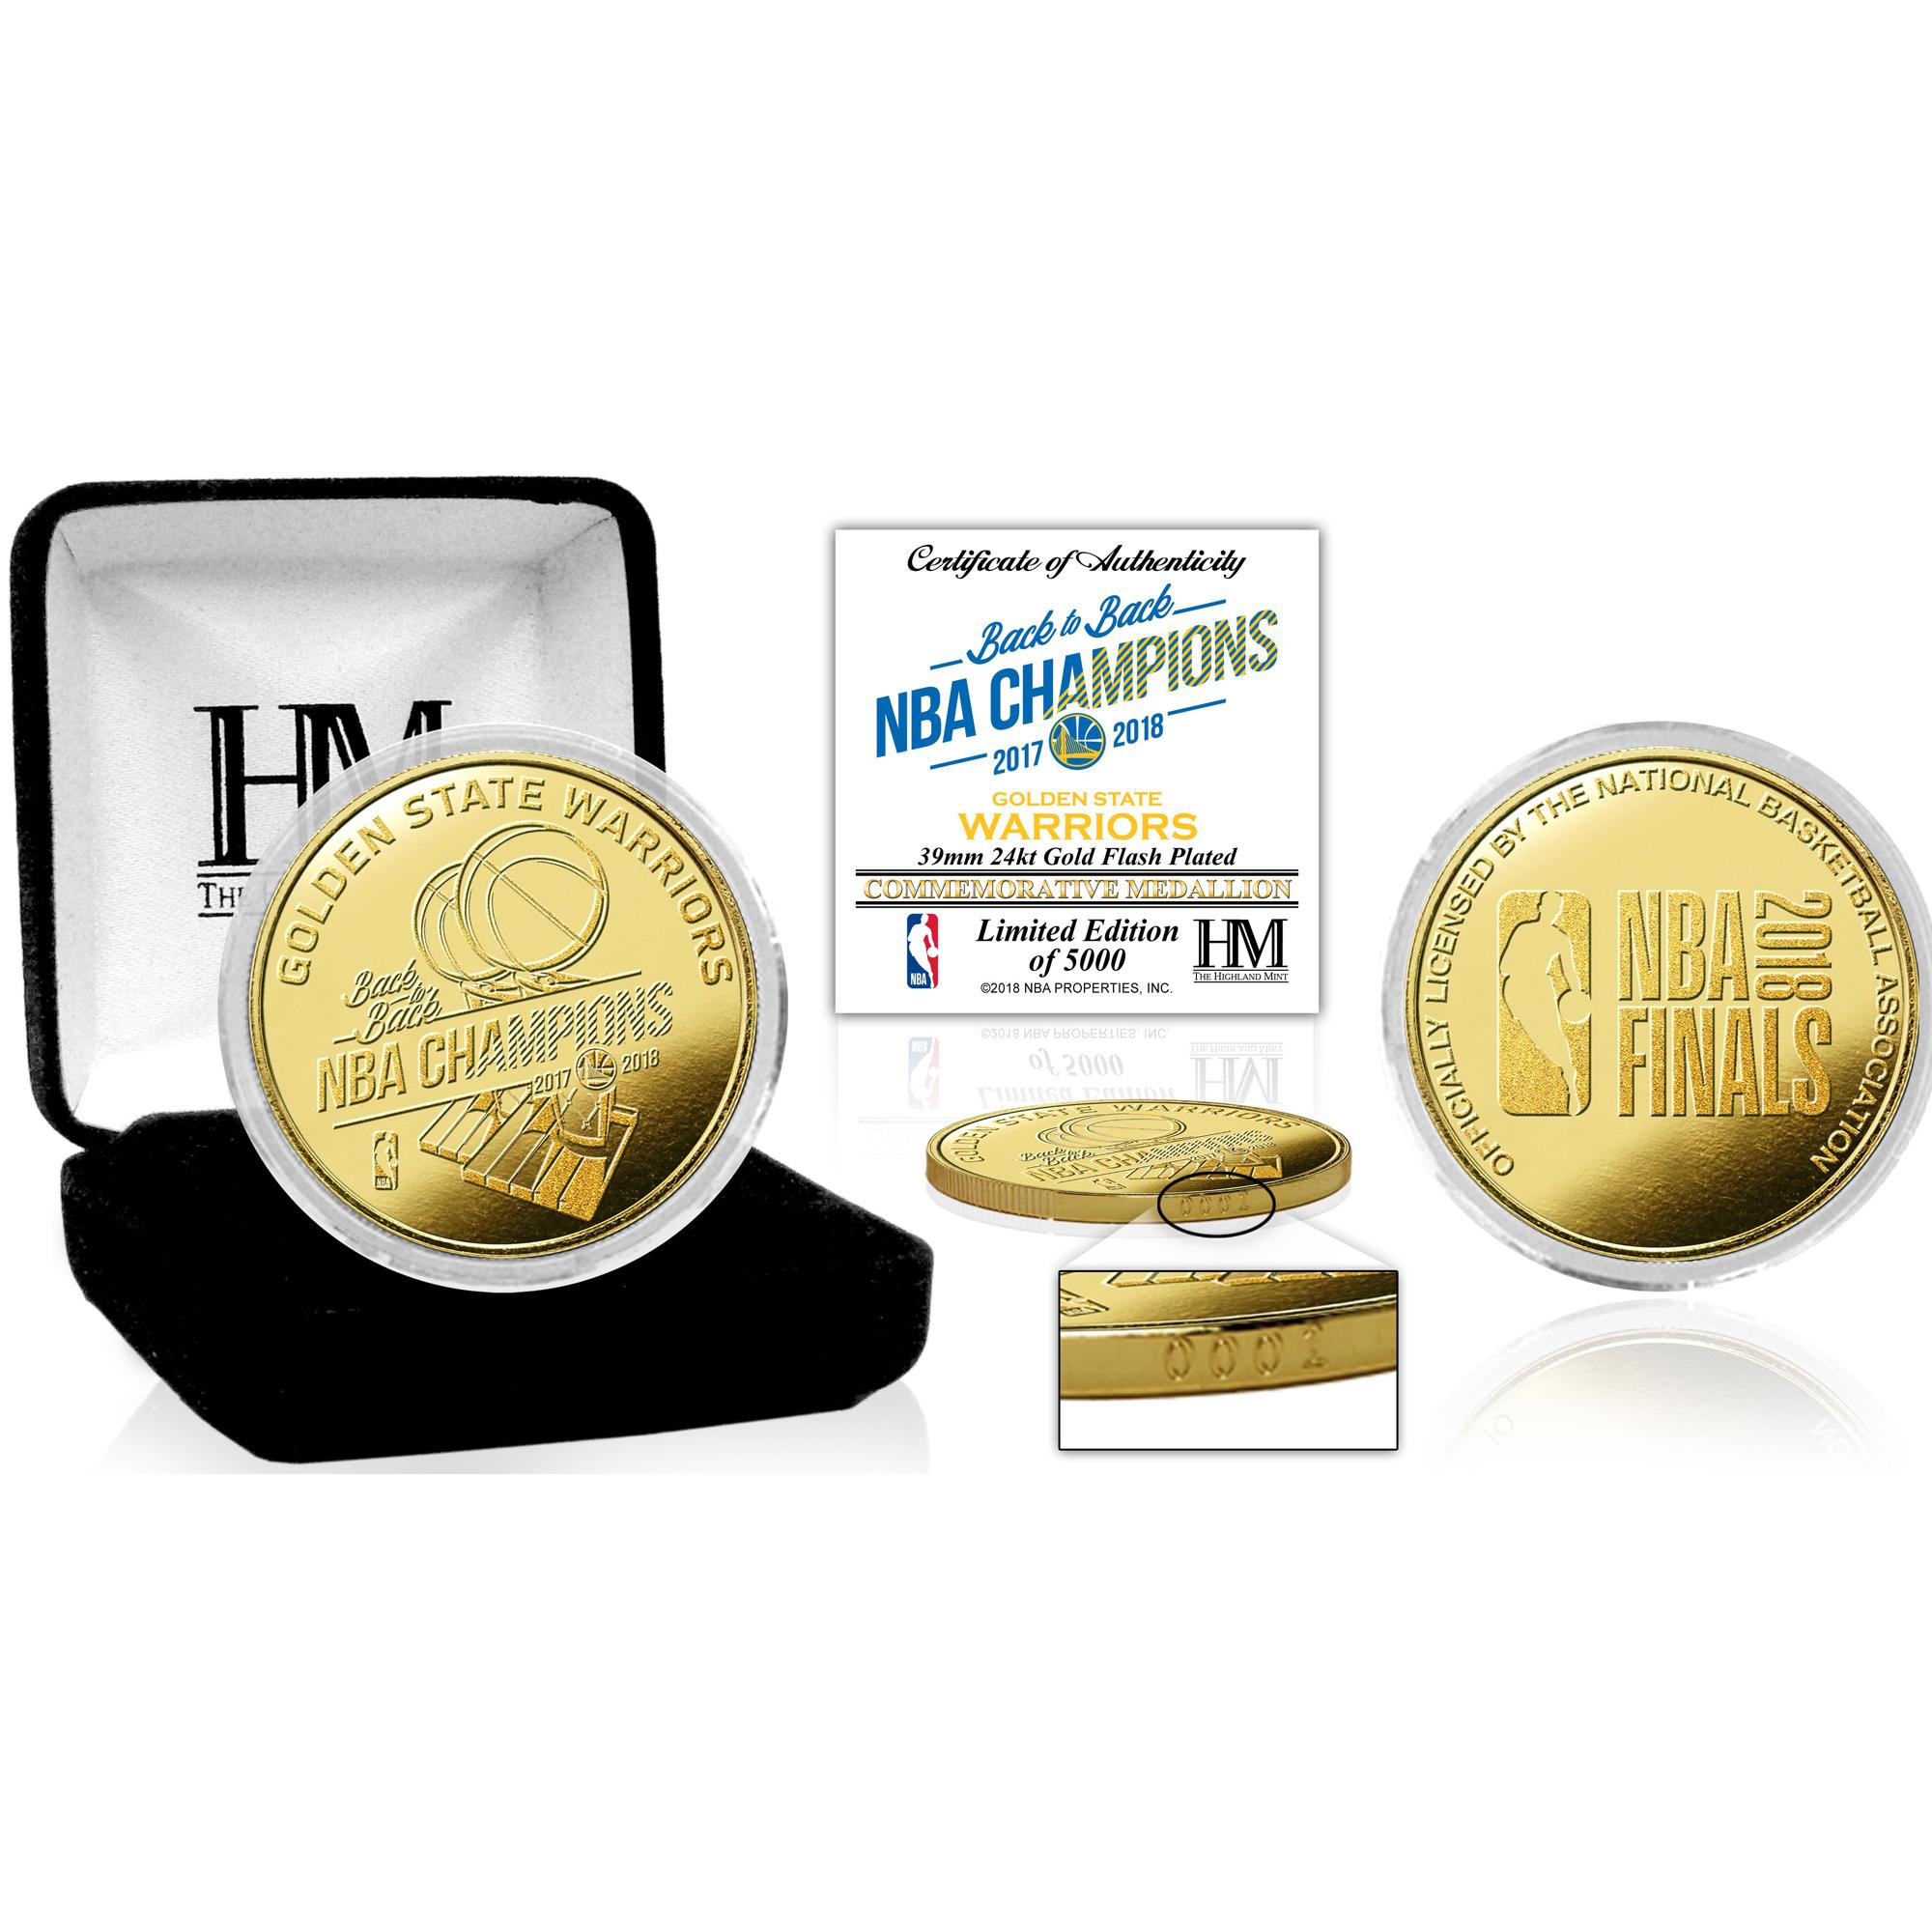 Golden State Warriors Highland Mint 2018 NBA Finals Champions Gold Coin - No Size